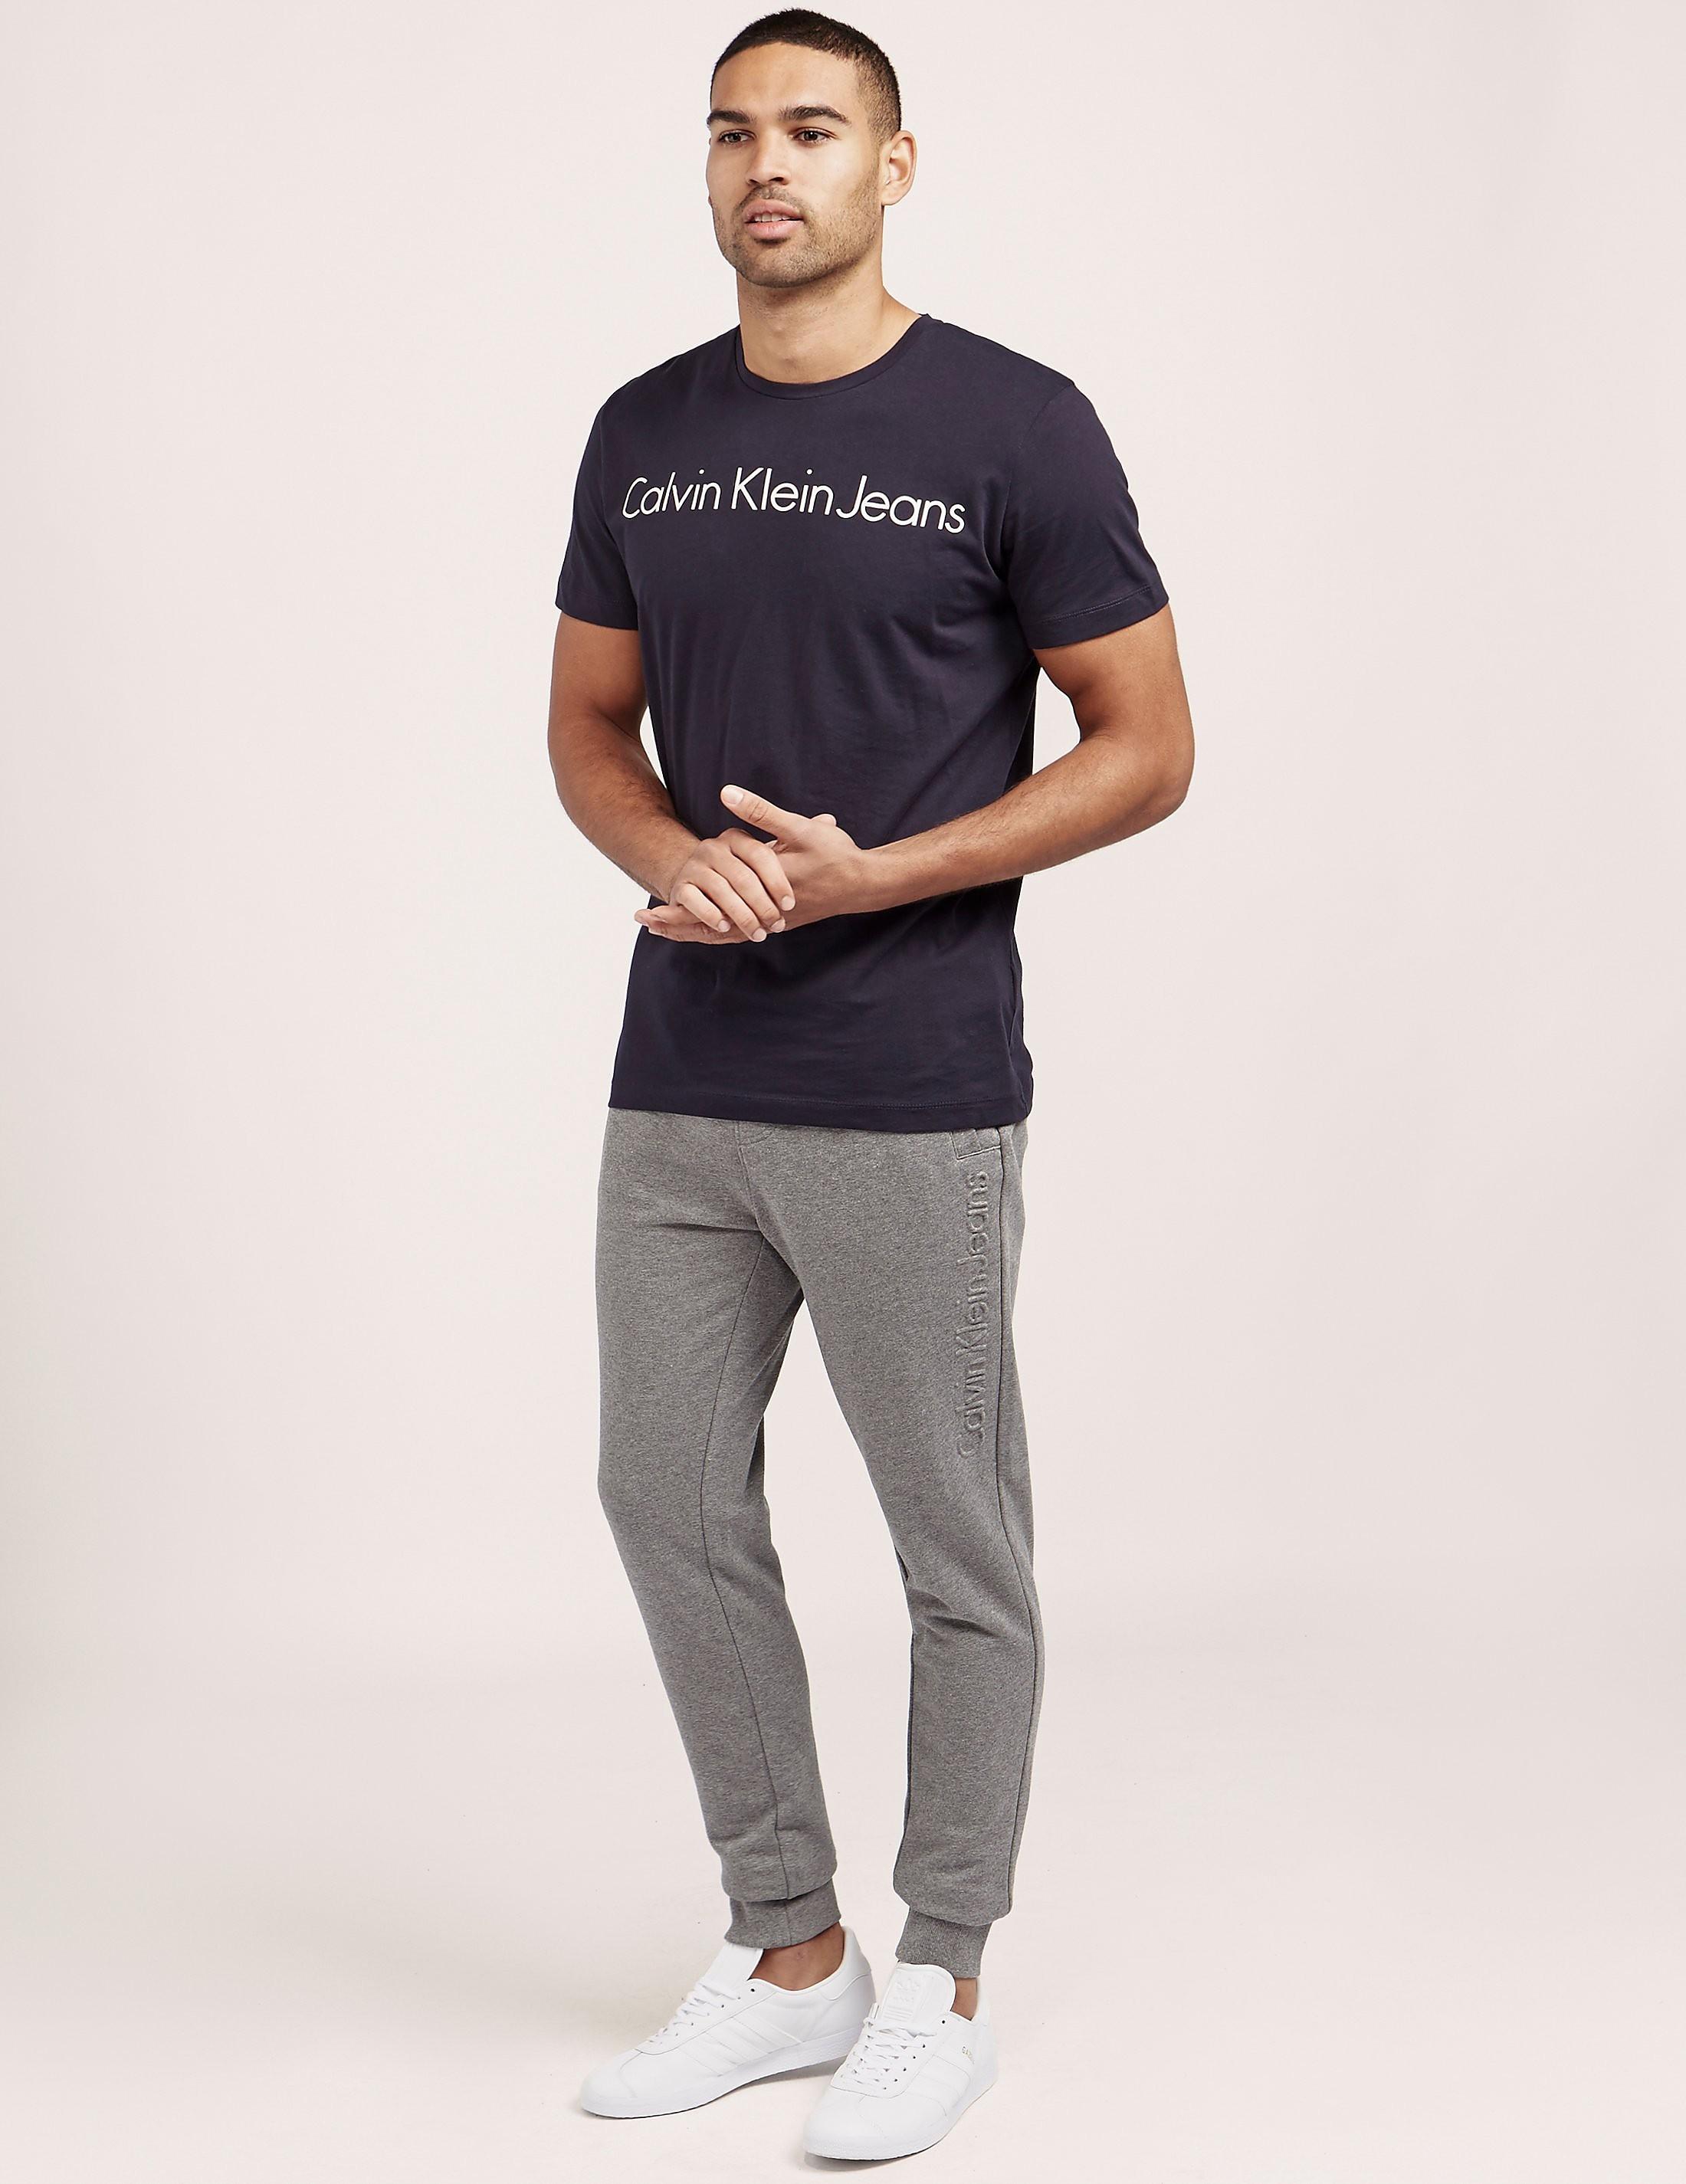 Calvin Klein Haero Cuffed Track Pants